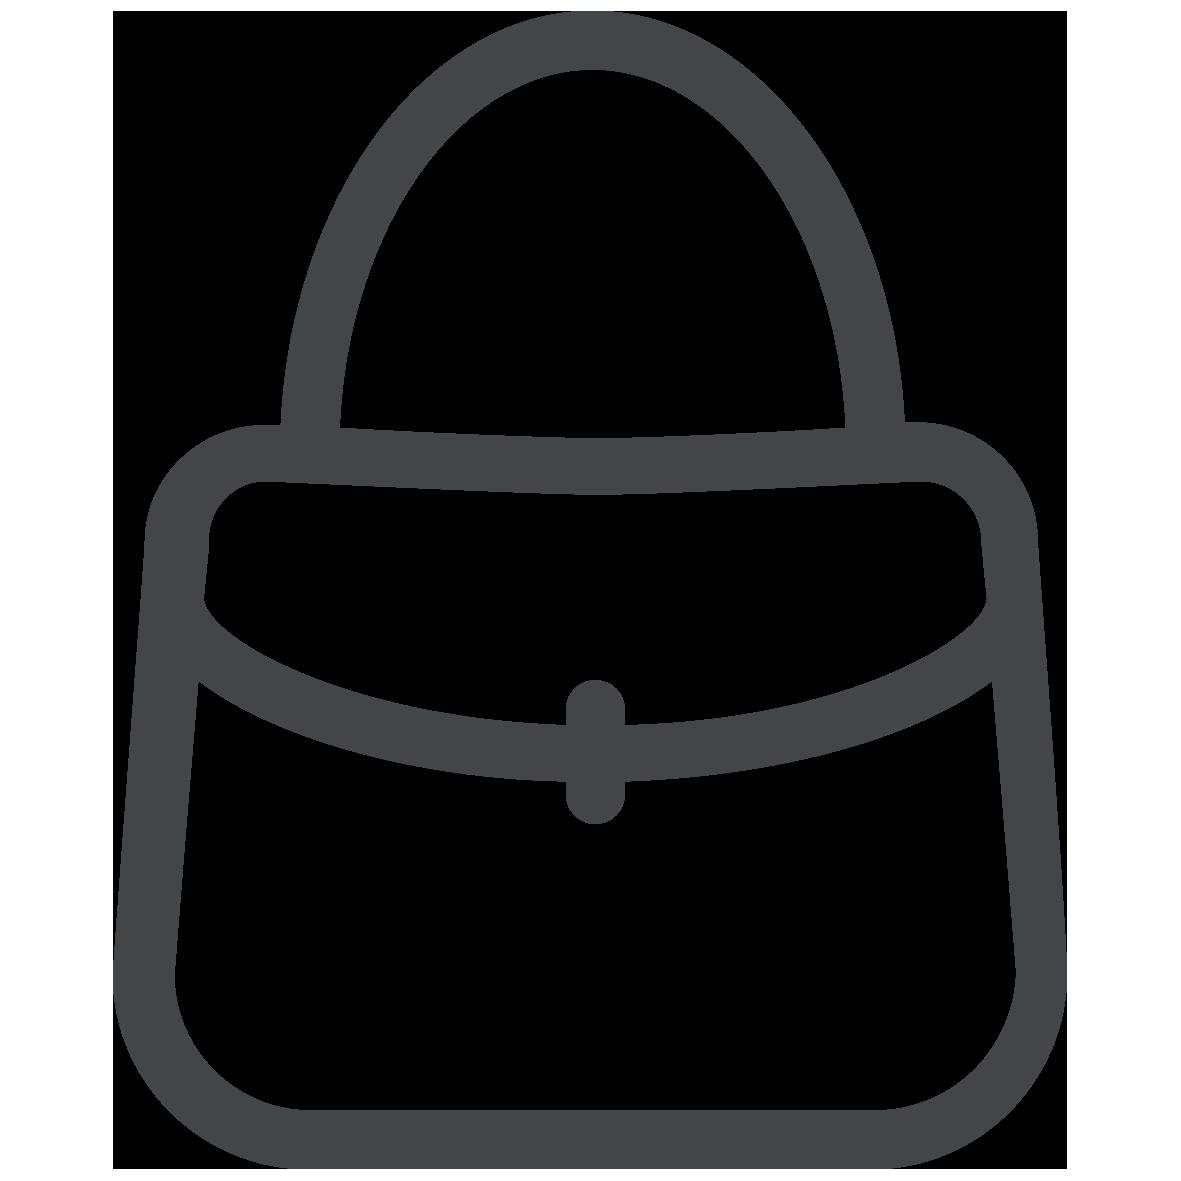 Lady clipart purse. Handbag clinic buy my